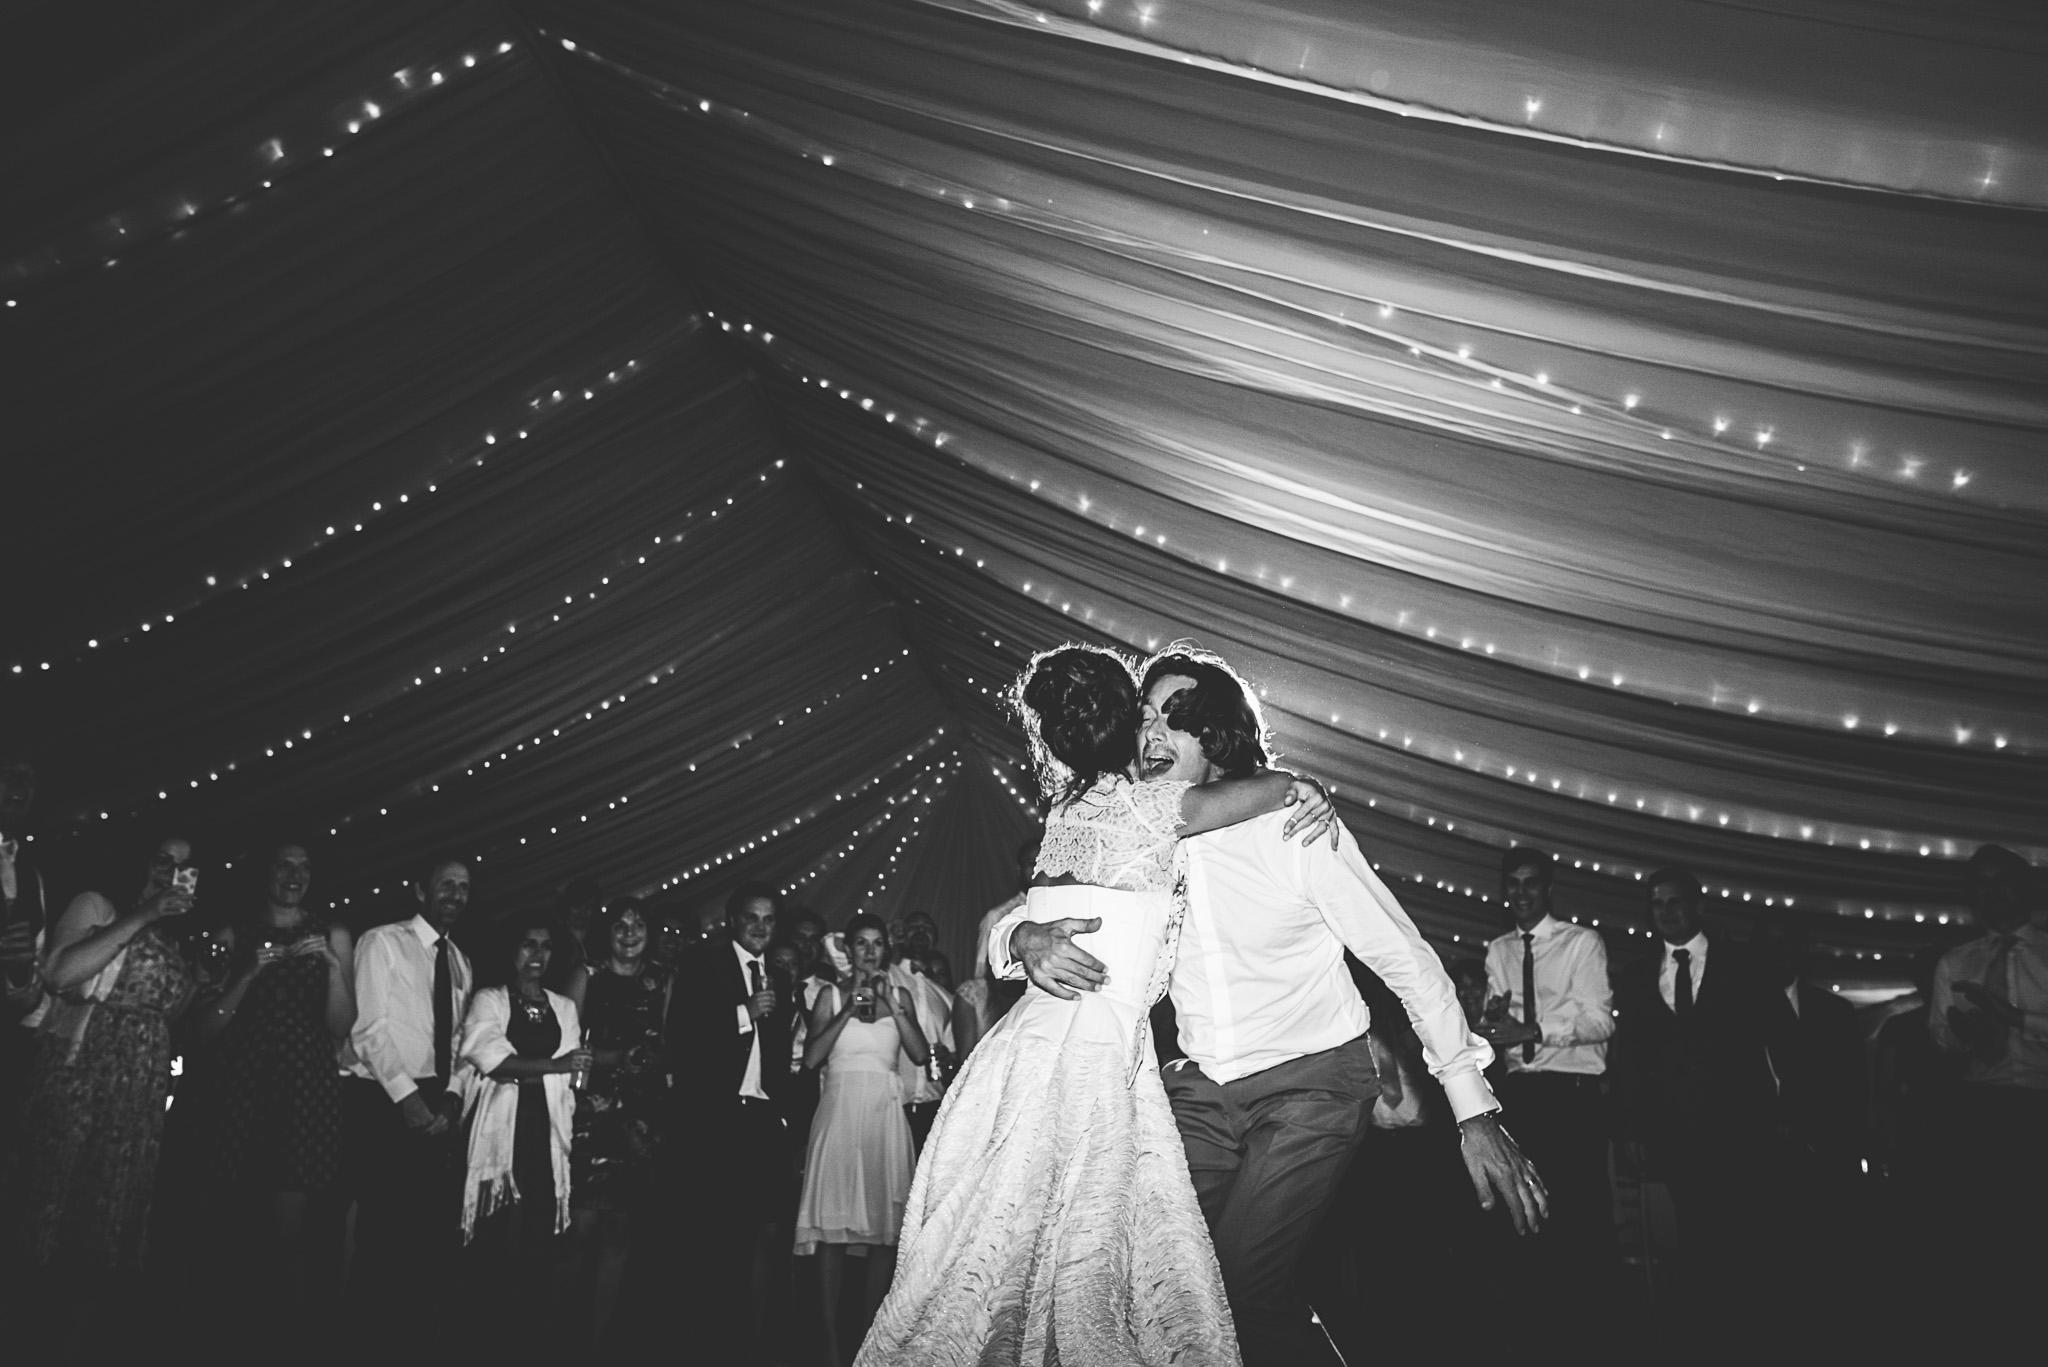 Lara & Jack Wedding 220815 by Barney Walters_1057_BW2_1055